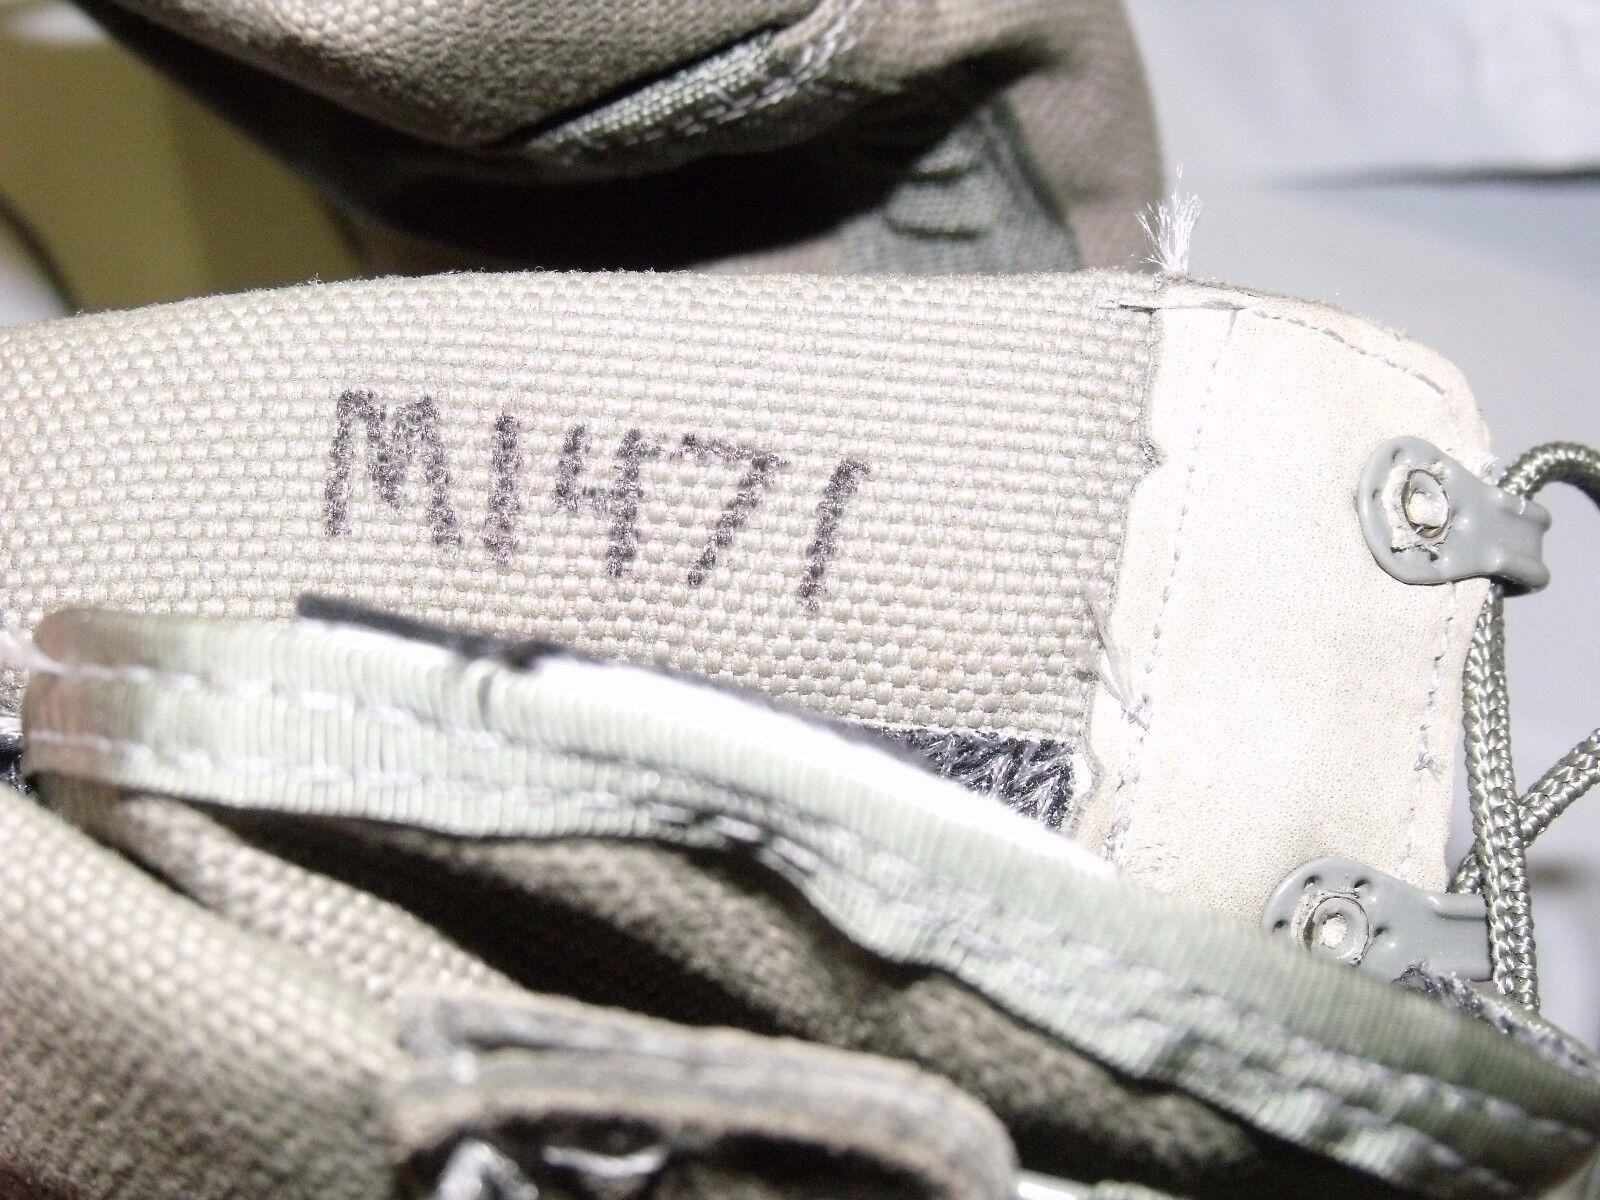 Military Boots 12.5 R Sage verde McRae Flight Waterproof USAF Flight McRae GoreTex 353 Issued ea9b05